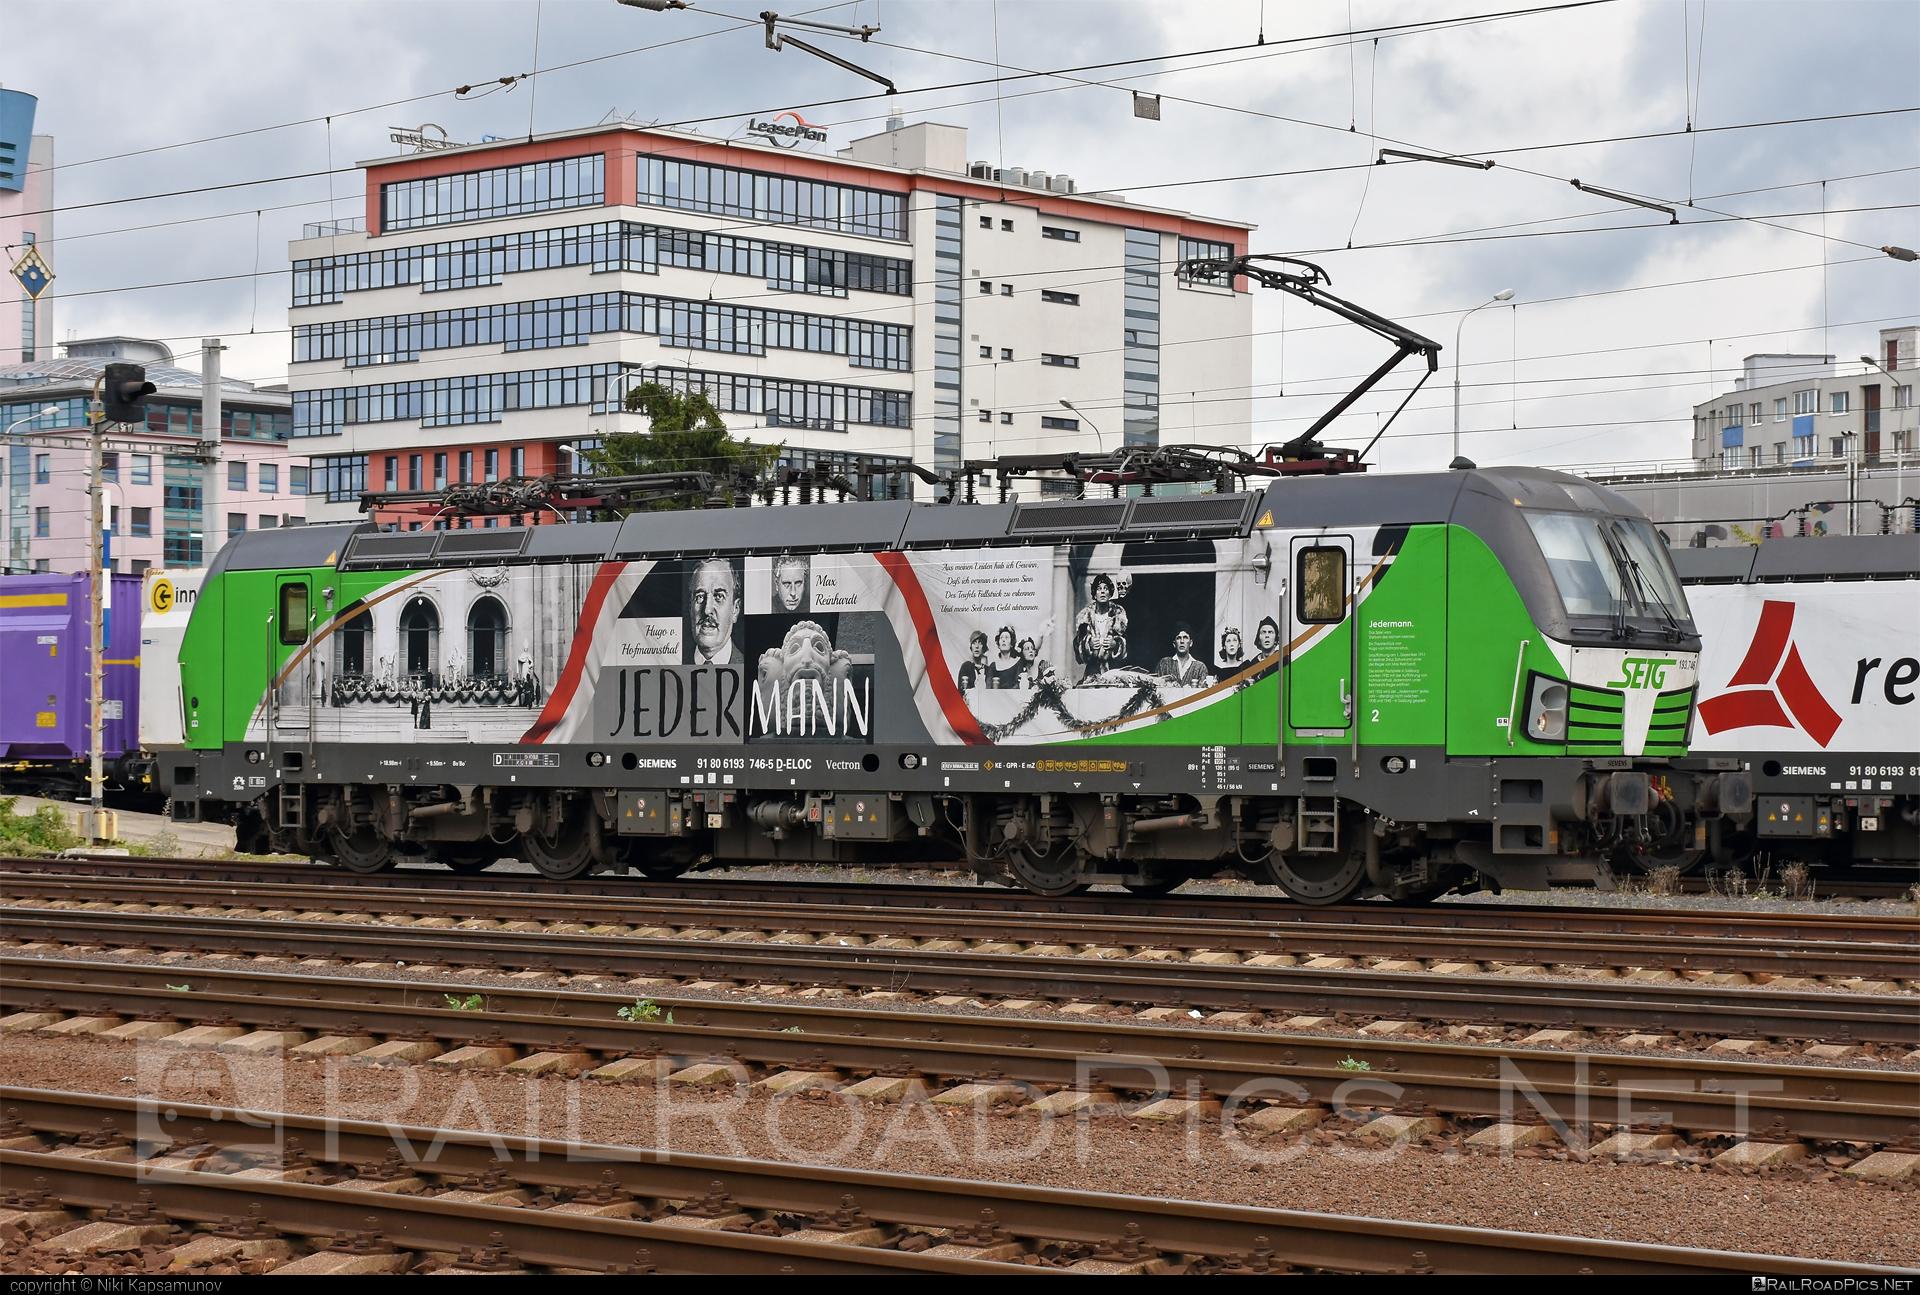 Siemens Vectron MS - 193 746 operated by Salzburger Eisenbahn Transportlogistik GmbH #SalzburgerEisenbahnTransportlogistik #SalzburgerEisenbahnTransportlogistikGmbH #ell #ellgermany #eloc #europeanlocomotiveleasing #setg #siemens #siemensvectron #siemensvectronms #vectron #vectronms